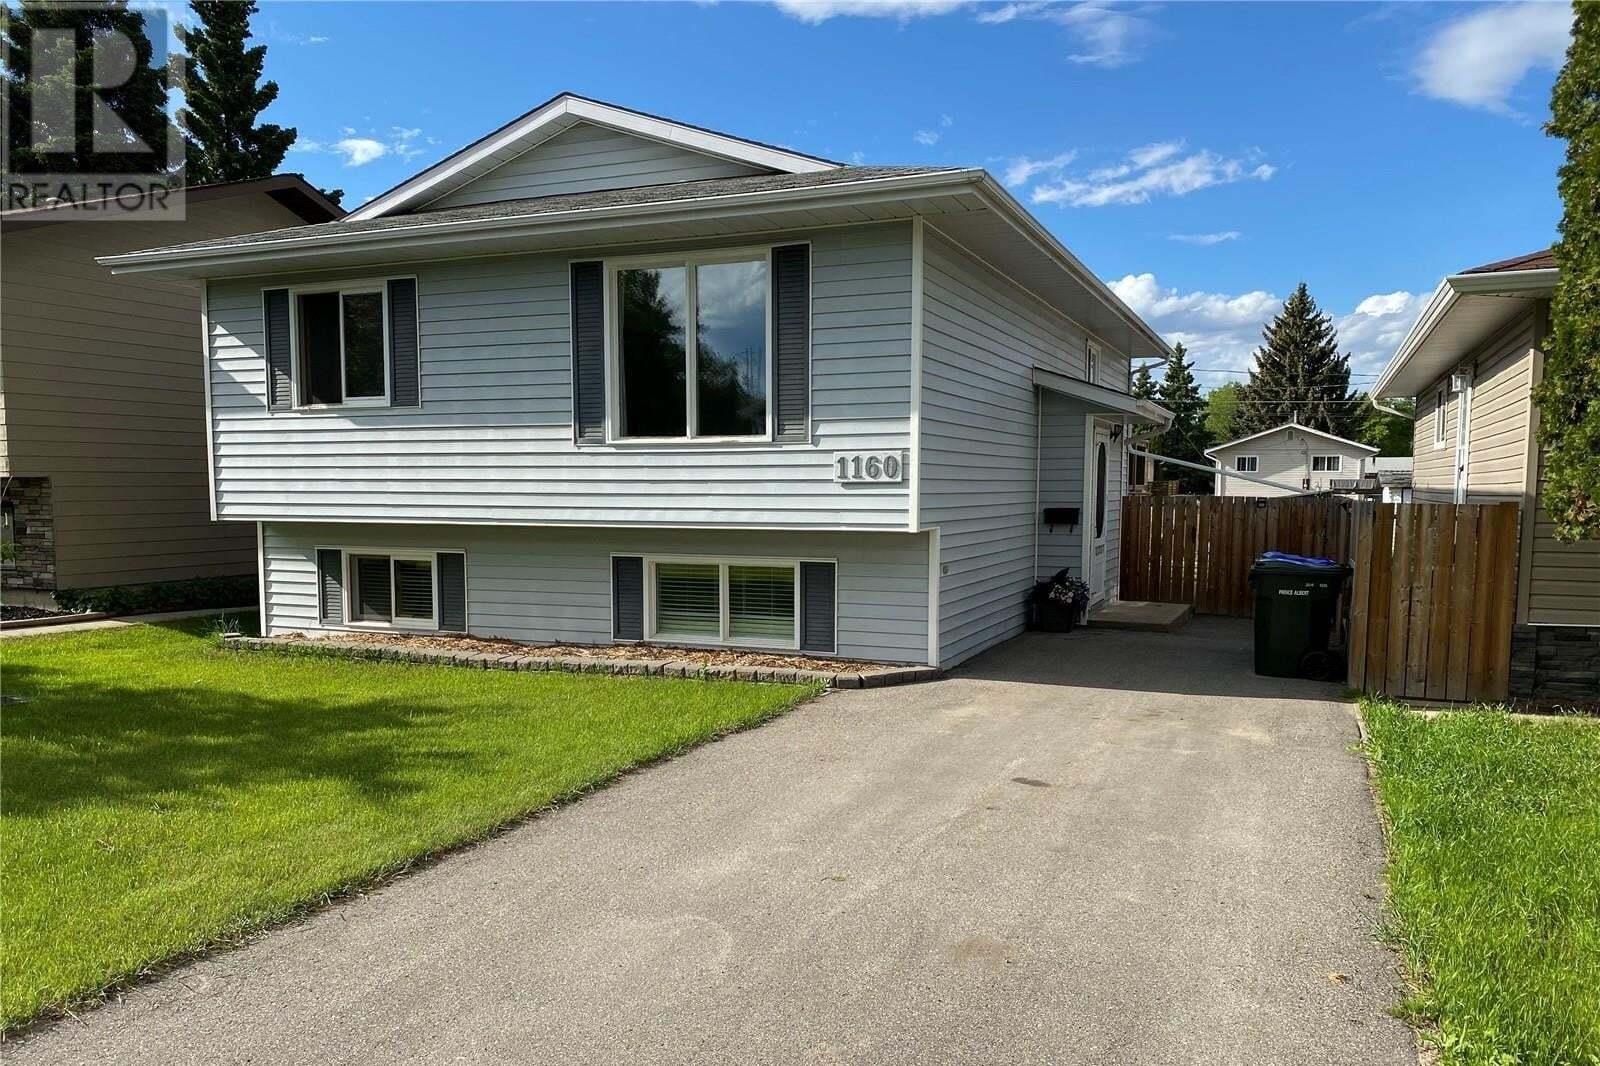 House for sale at 1160 4th St E Prince Albert Saskatchewan - MLS: SK812731